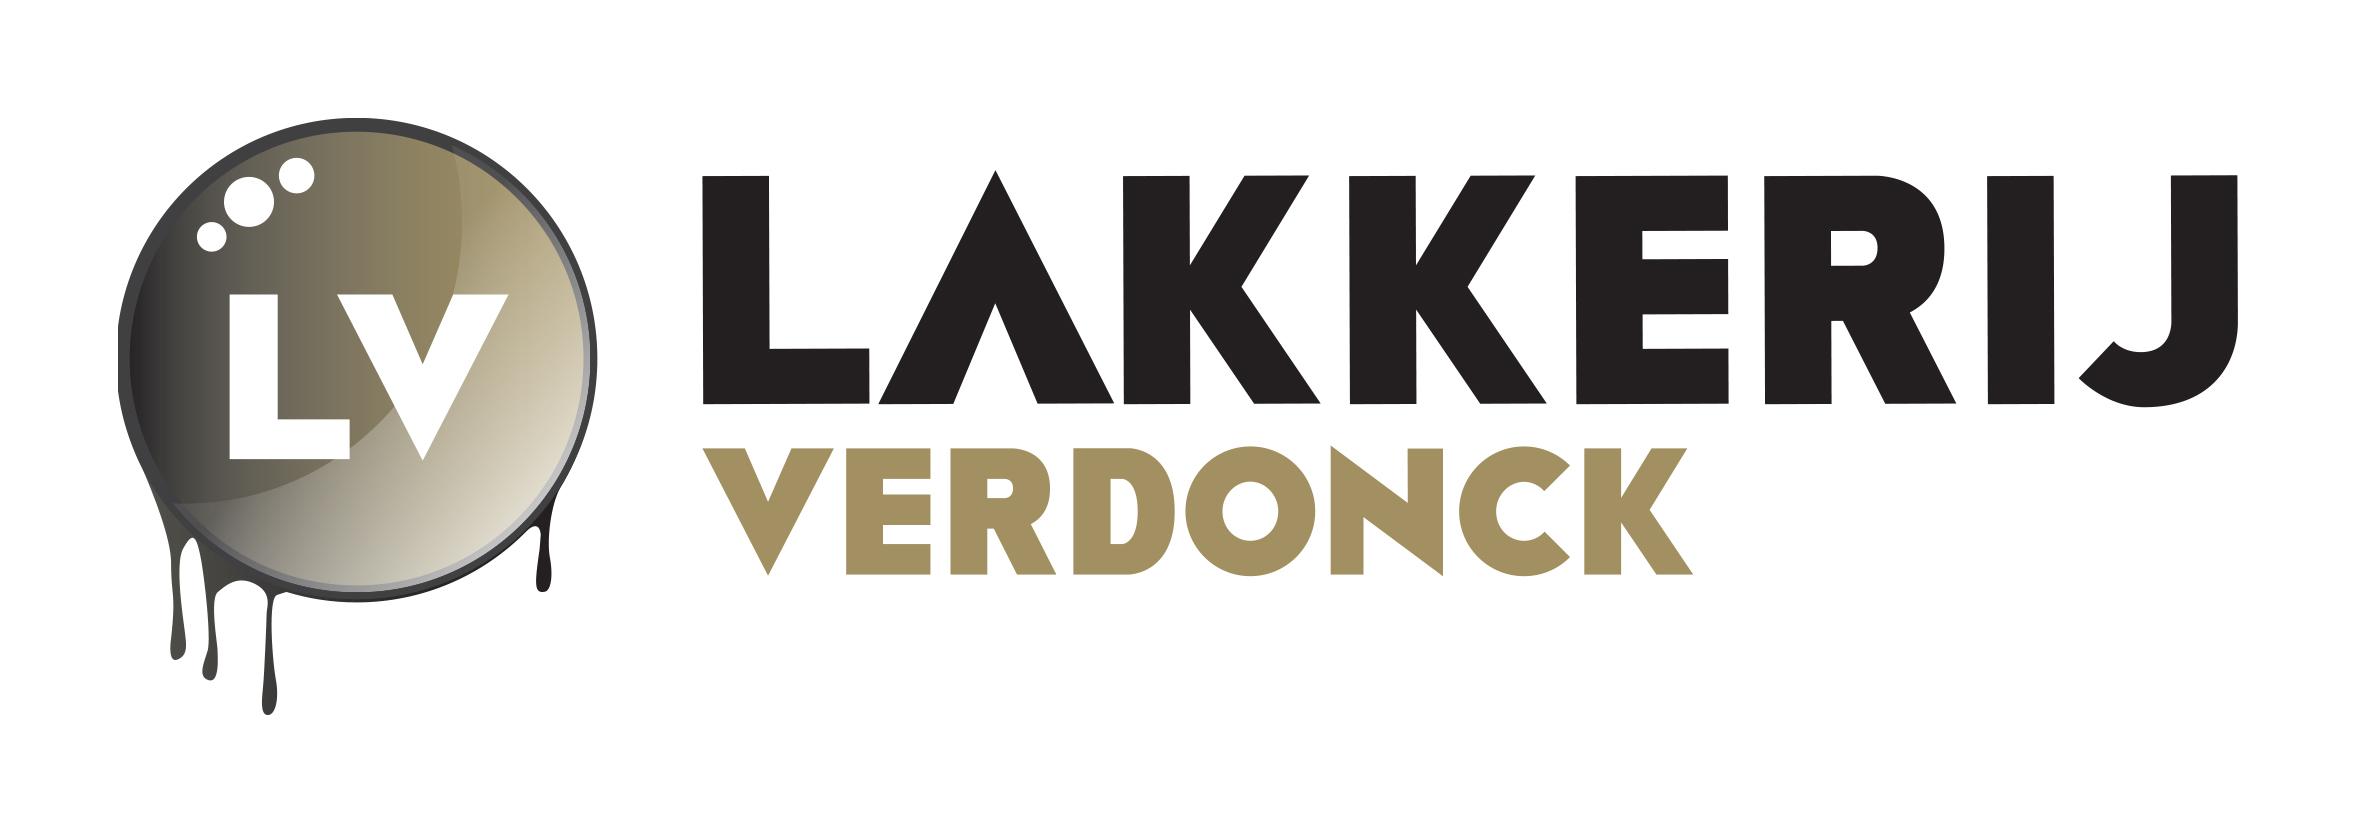 Lakkerij Verdonck